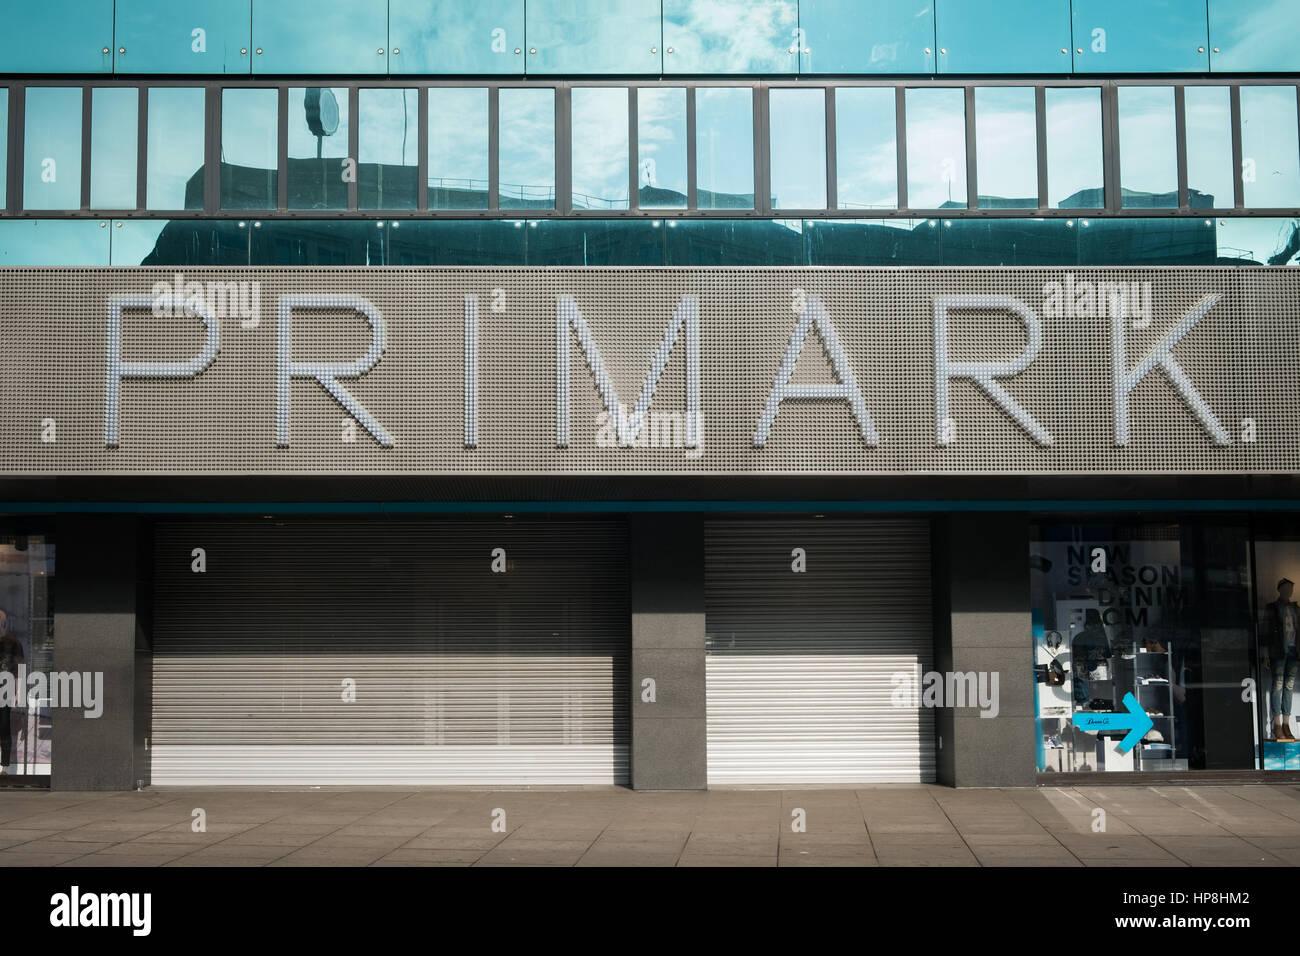 primark logo stock photos primark logo stock images alamy. Black Bedroom Furniture Sets. Home Design Ideas